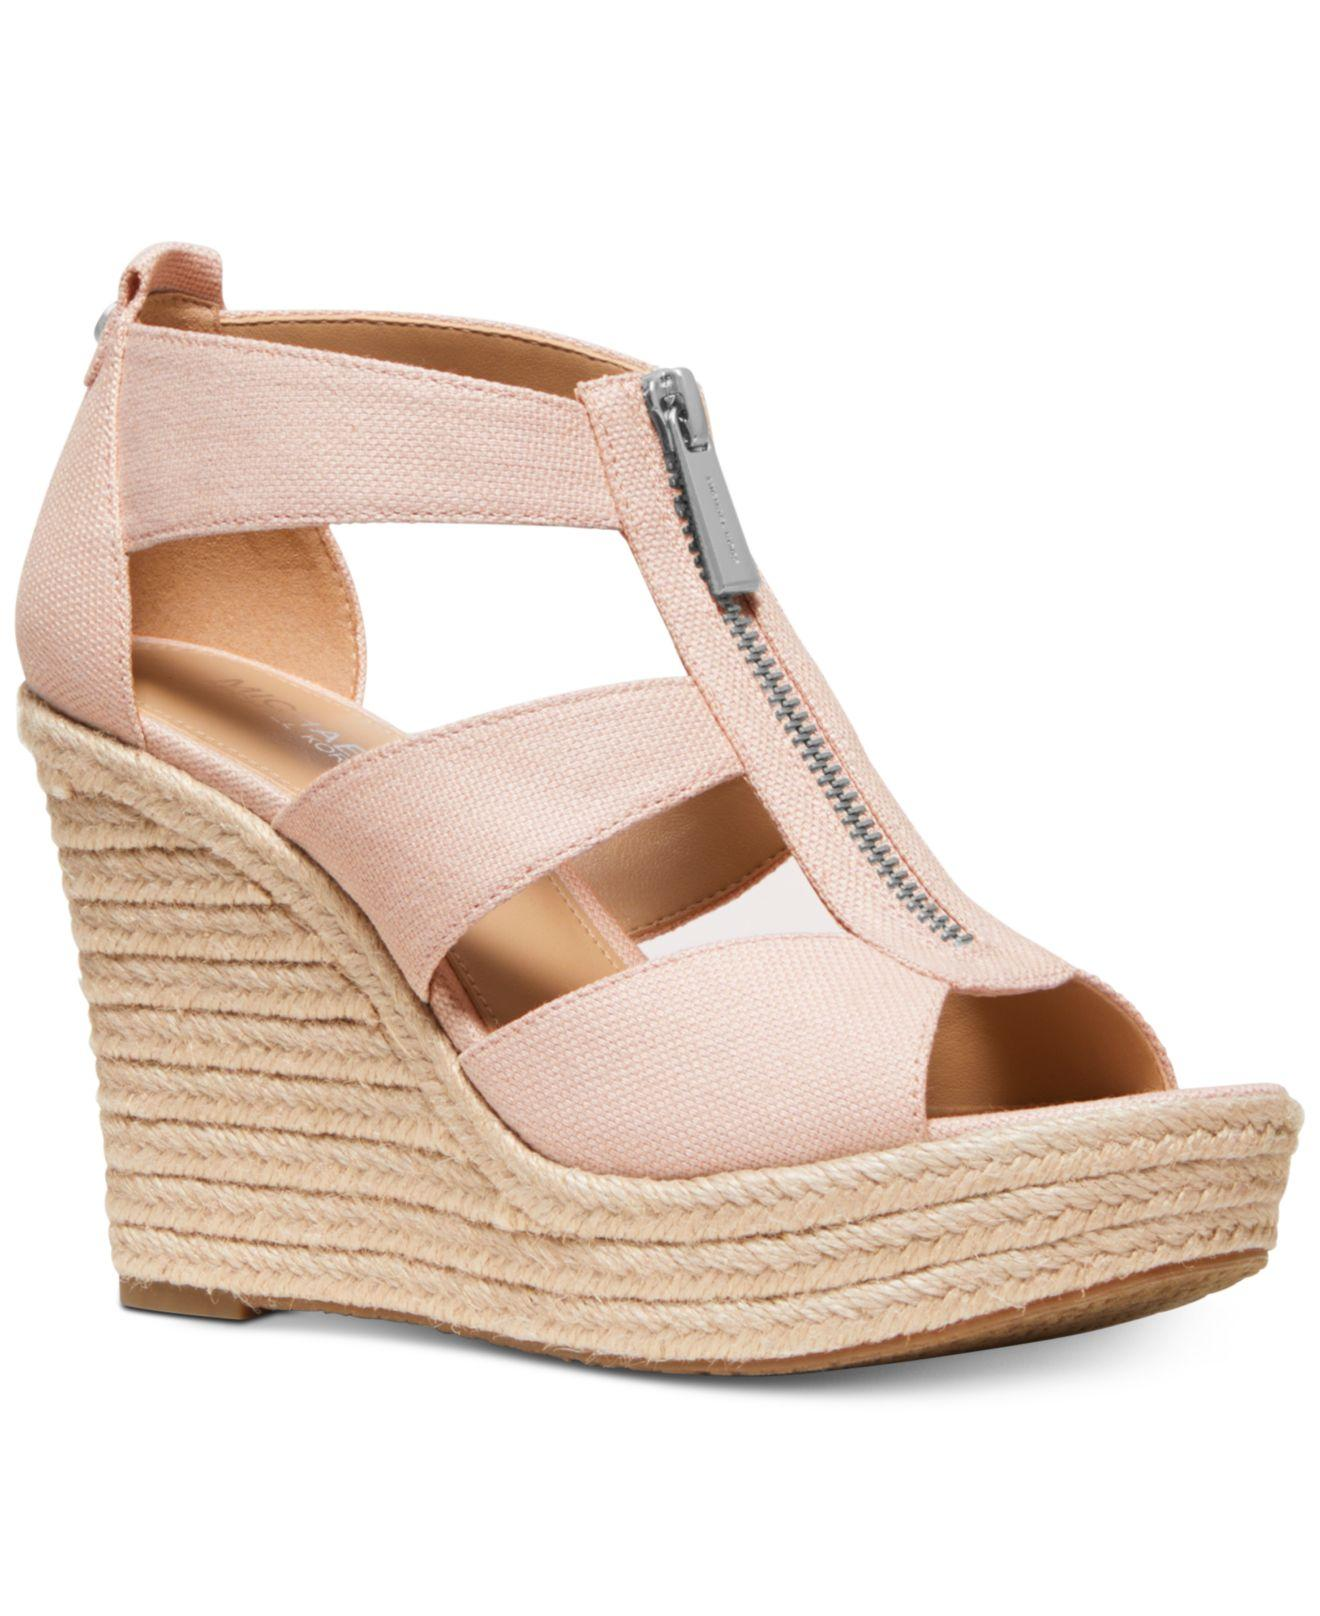 eb6f3a2952d Michael Kors - Pink Michael Damita Platform Wedge Sandals - Lyst. View  fullscreen